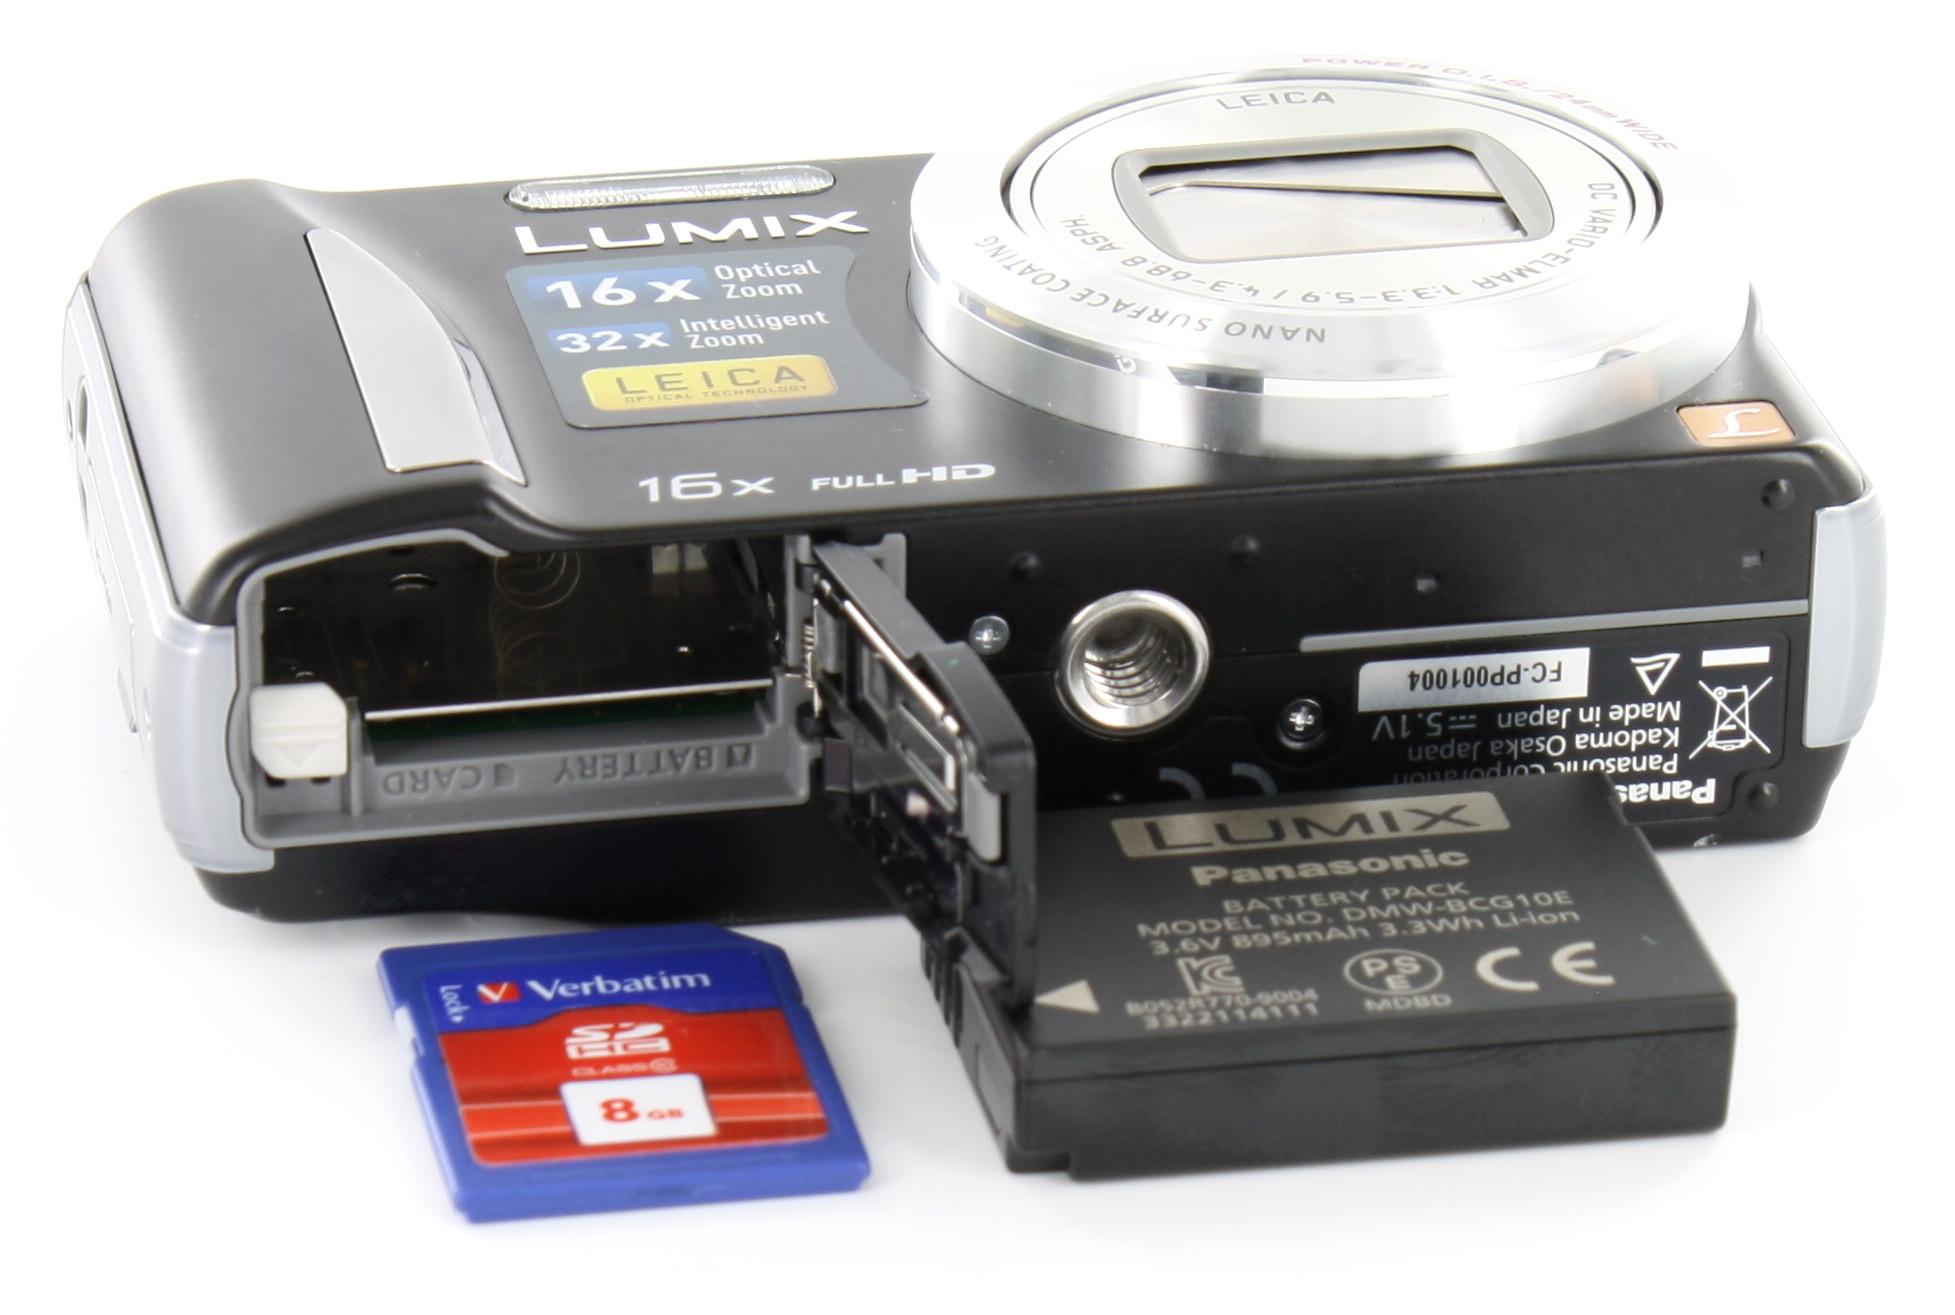 Panasonic Lumix DMC-TZ25 ZS15 Zoom Review   ePHOTOzine